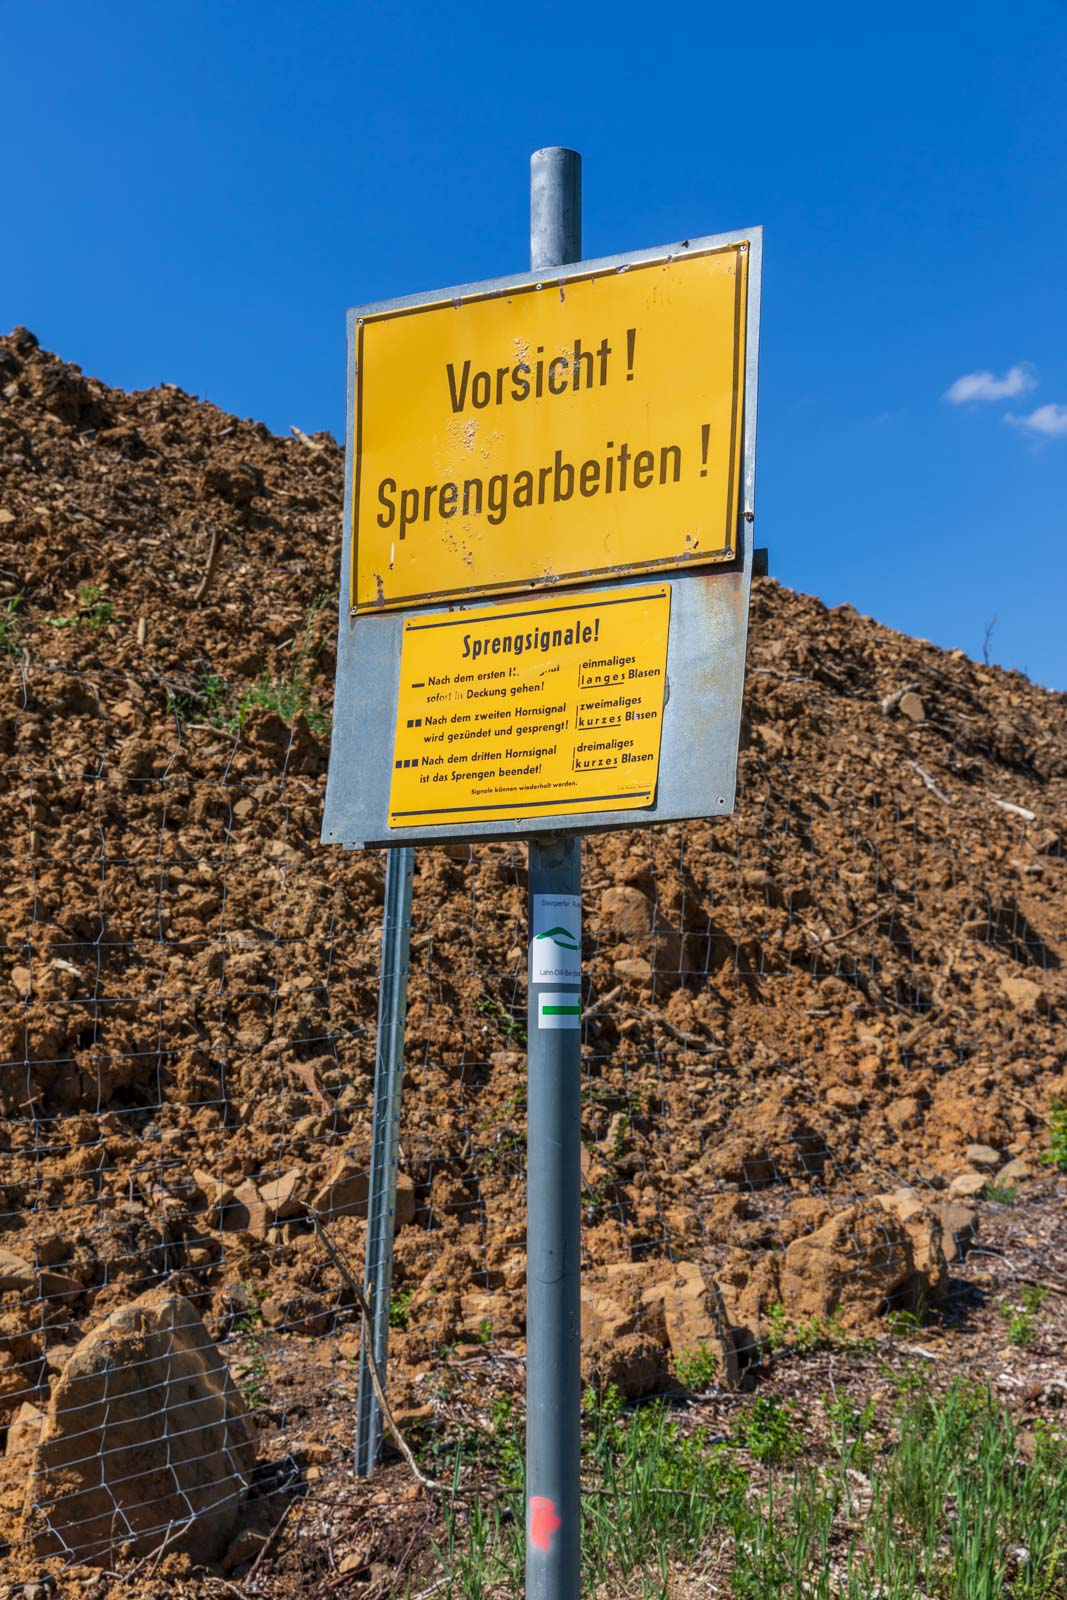 Deutschland, Europa, Europe, Extratour, Germany, Hessen, Hessia, Hiking, Hinterland, Lahn-Dill-Bergland, Location, Ort, Sommer, Summer, Wandern